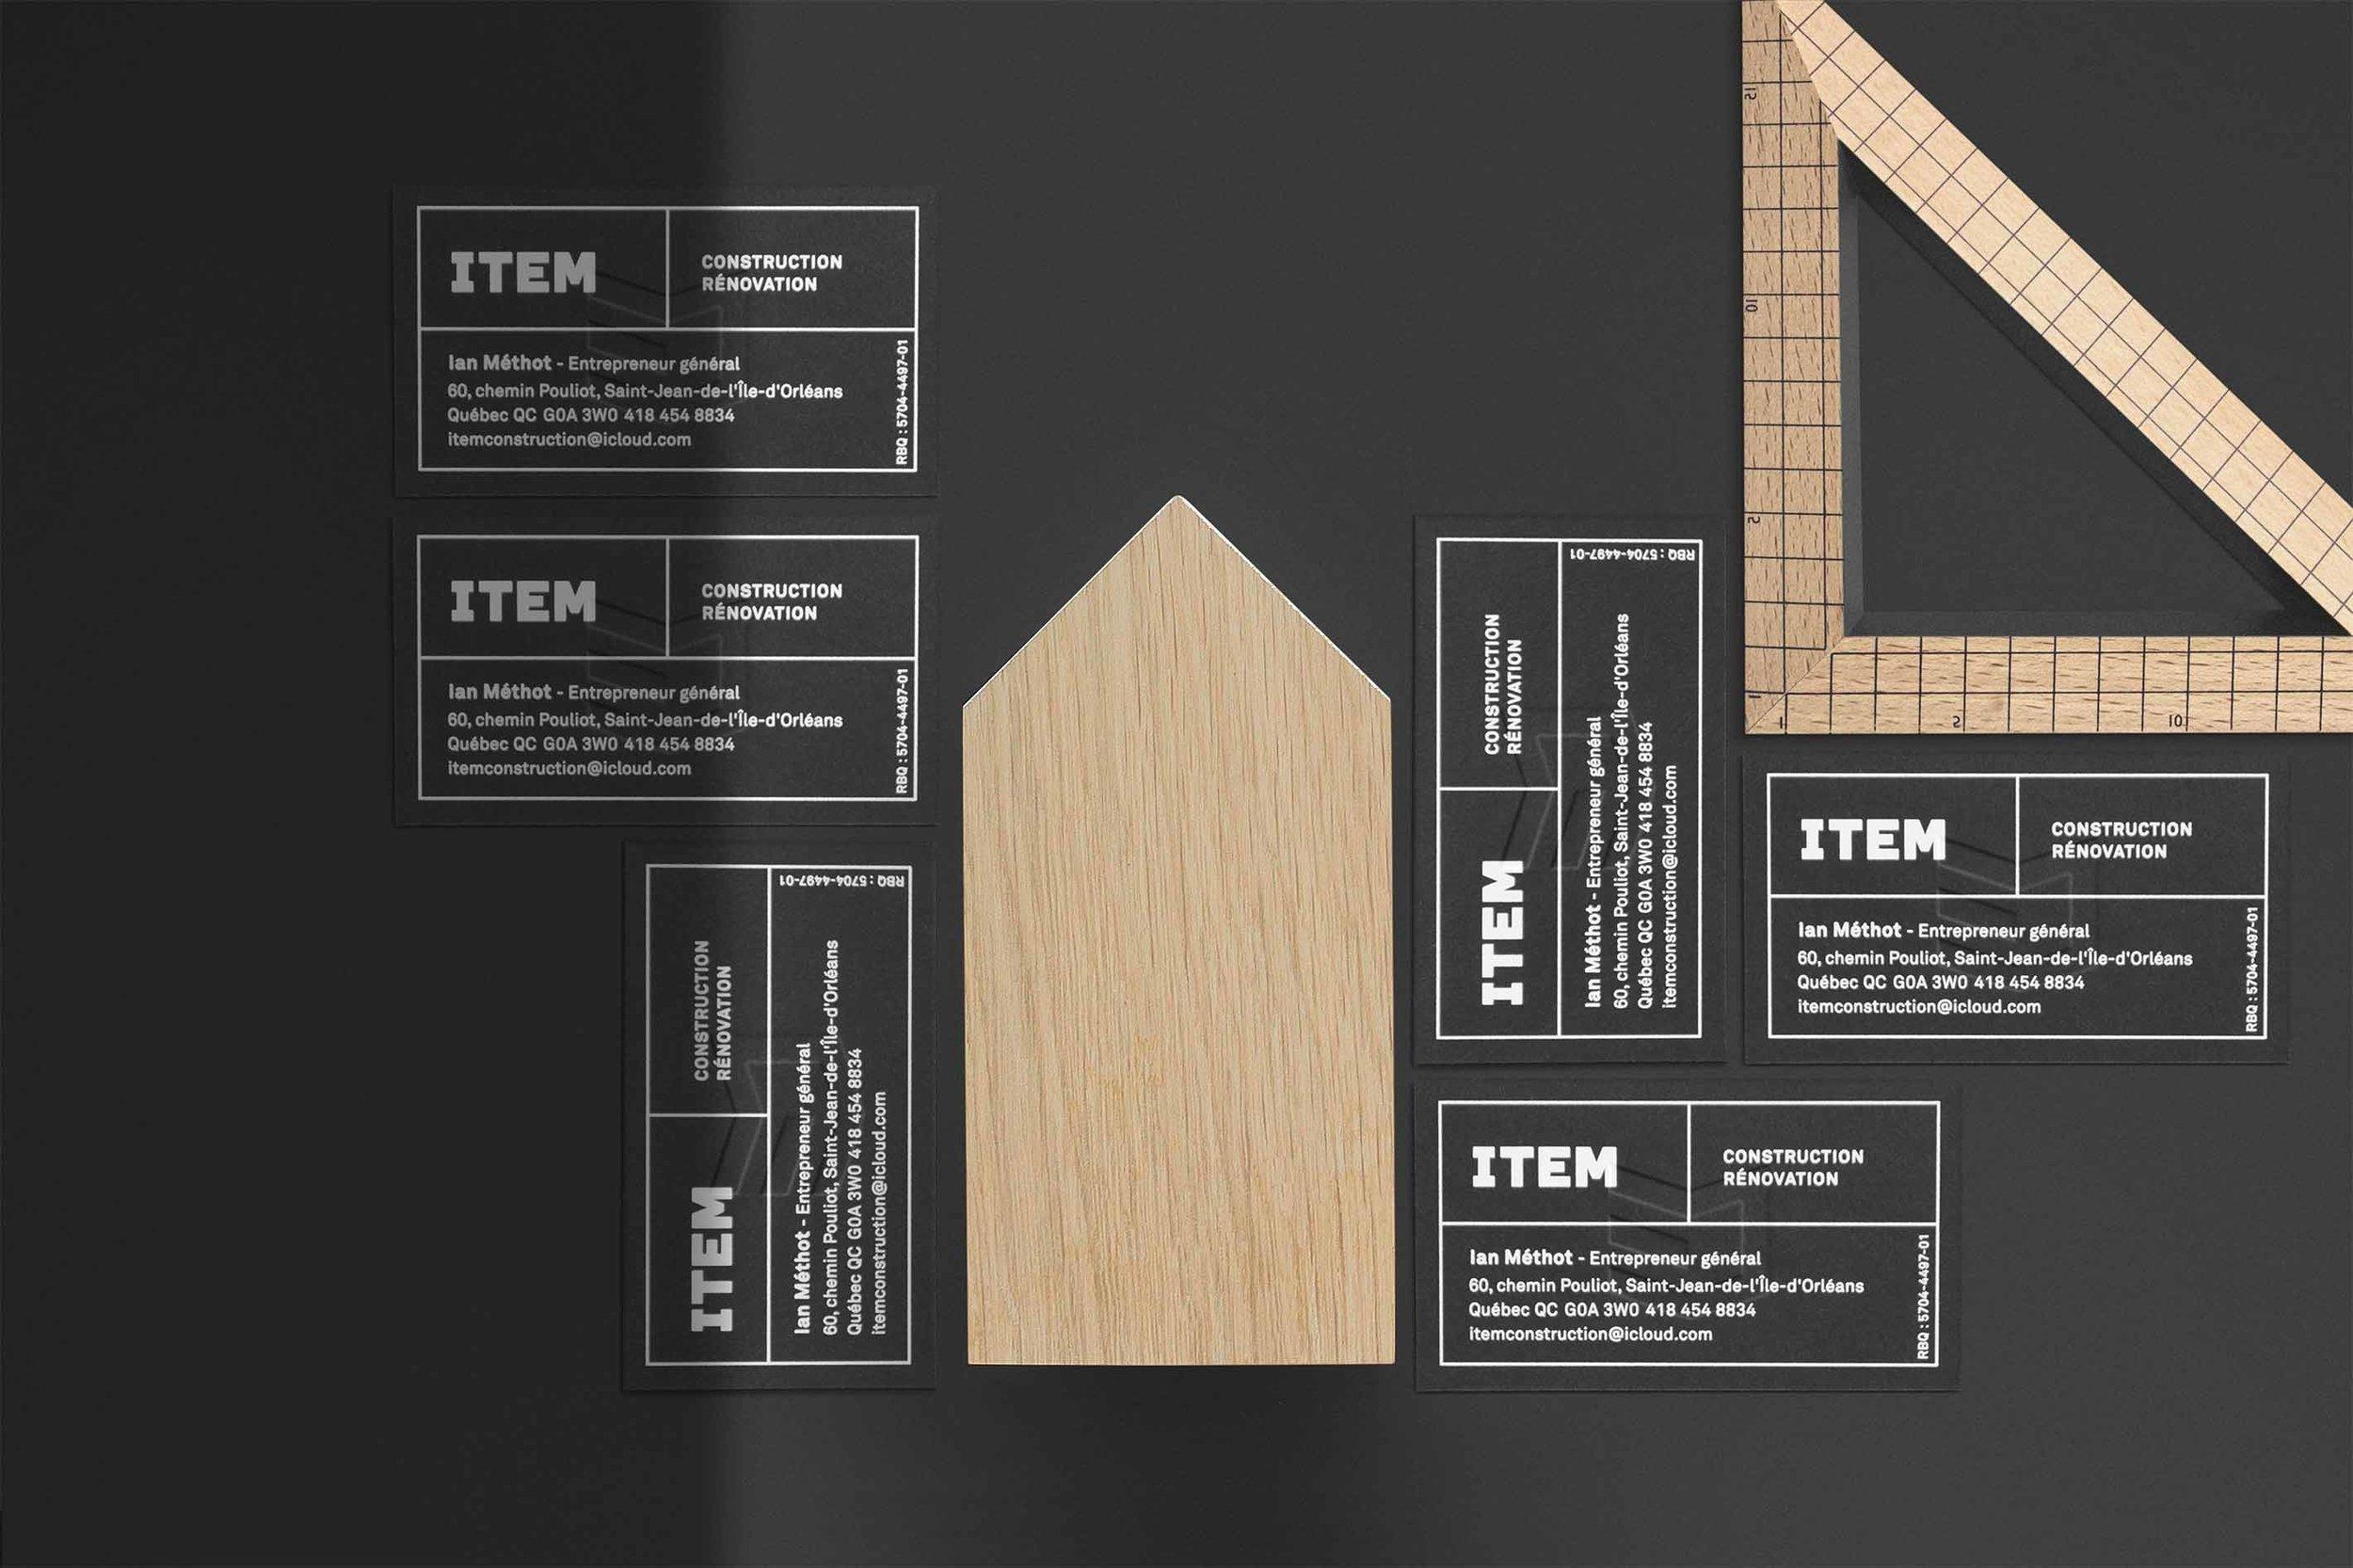 Figure-Jeremy-Hall-Design-Graphique-Quebec-Logo-Branding-Image-De-Marque-Item-Construction-4.jpg